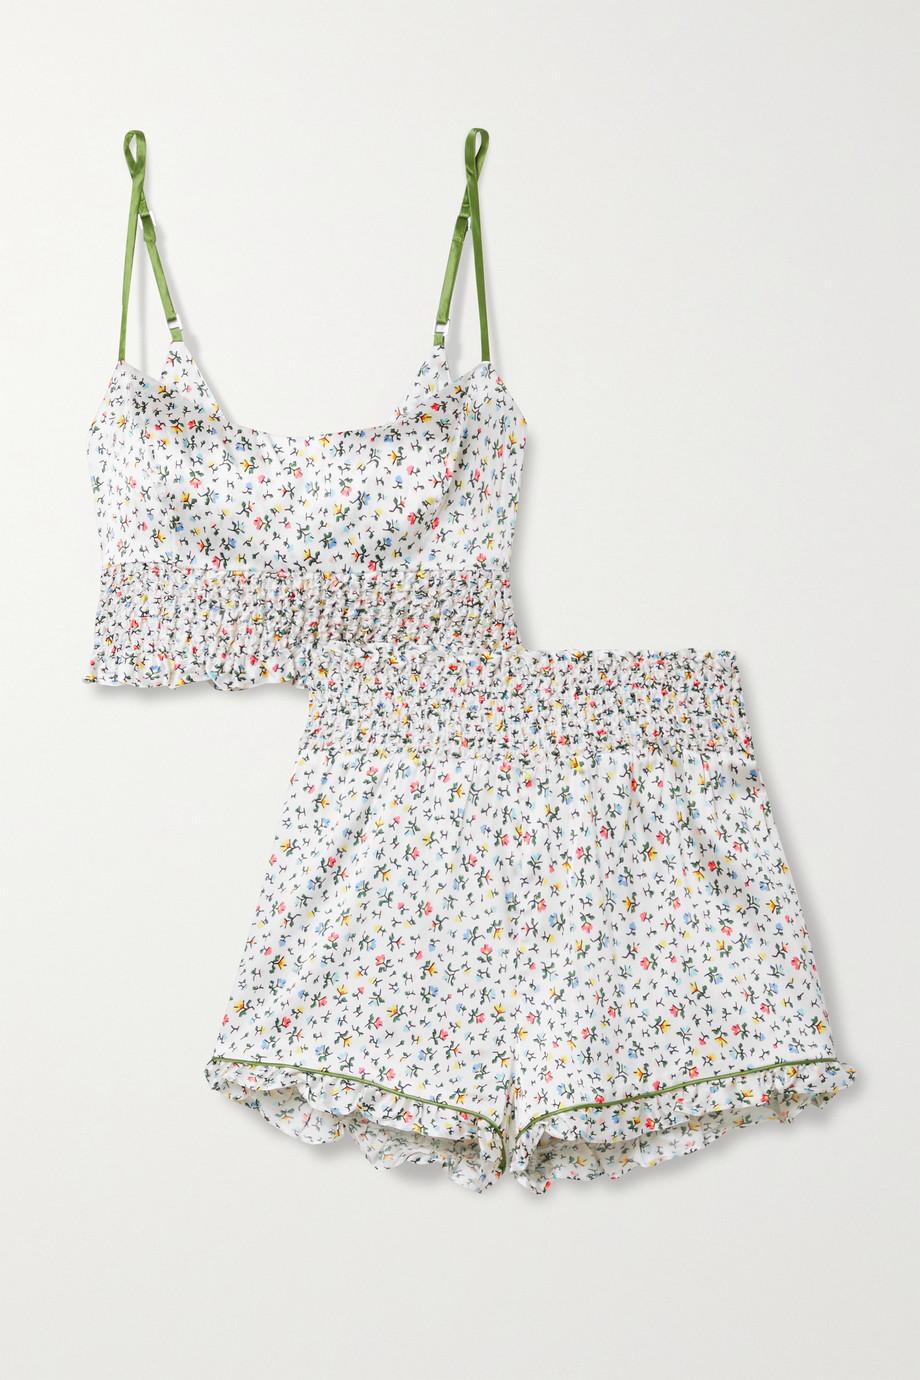 Morgan Lane Pyjama en satin de soie mélangée à imprimé fleuri et à smocks Lia Marta